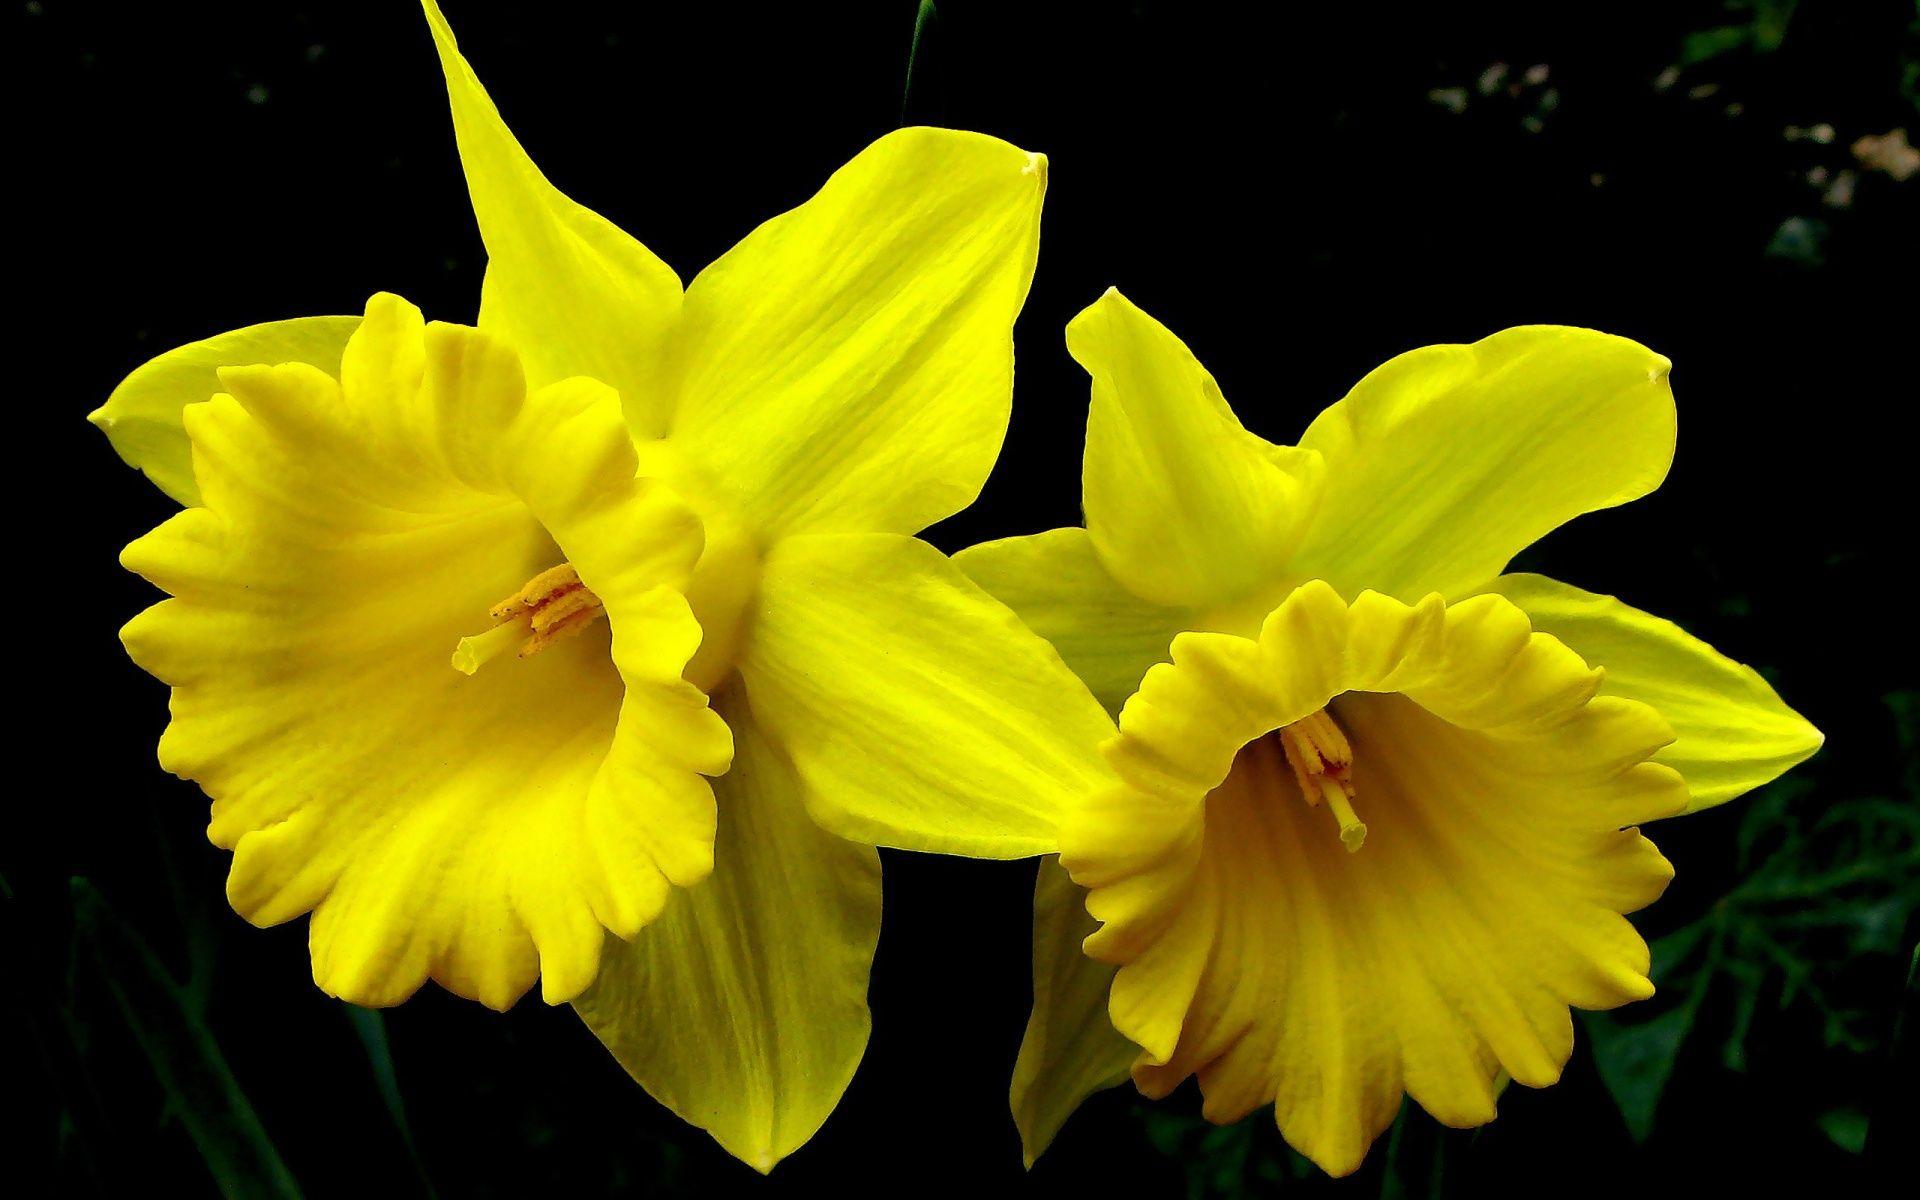 Yellow Daffodil Yellow Daffodils Wallpaper Wallpapers 1920x1200 Mrwallpaper Com Daffodil Flower Daffodils Flowers